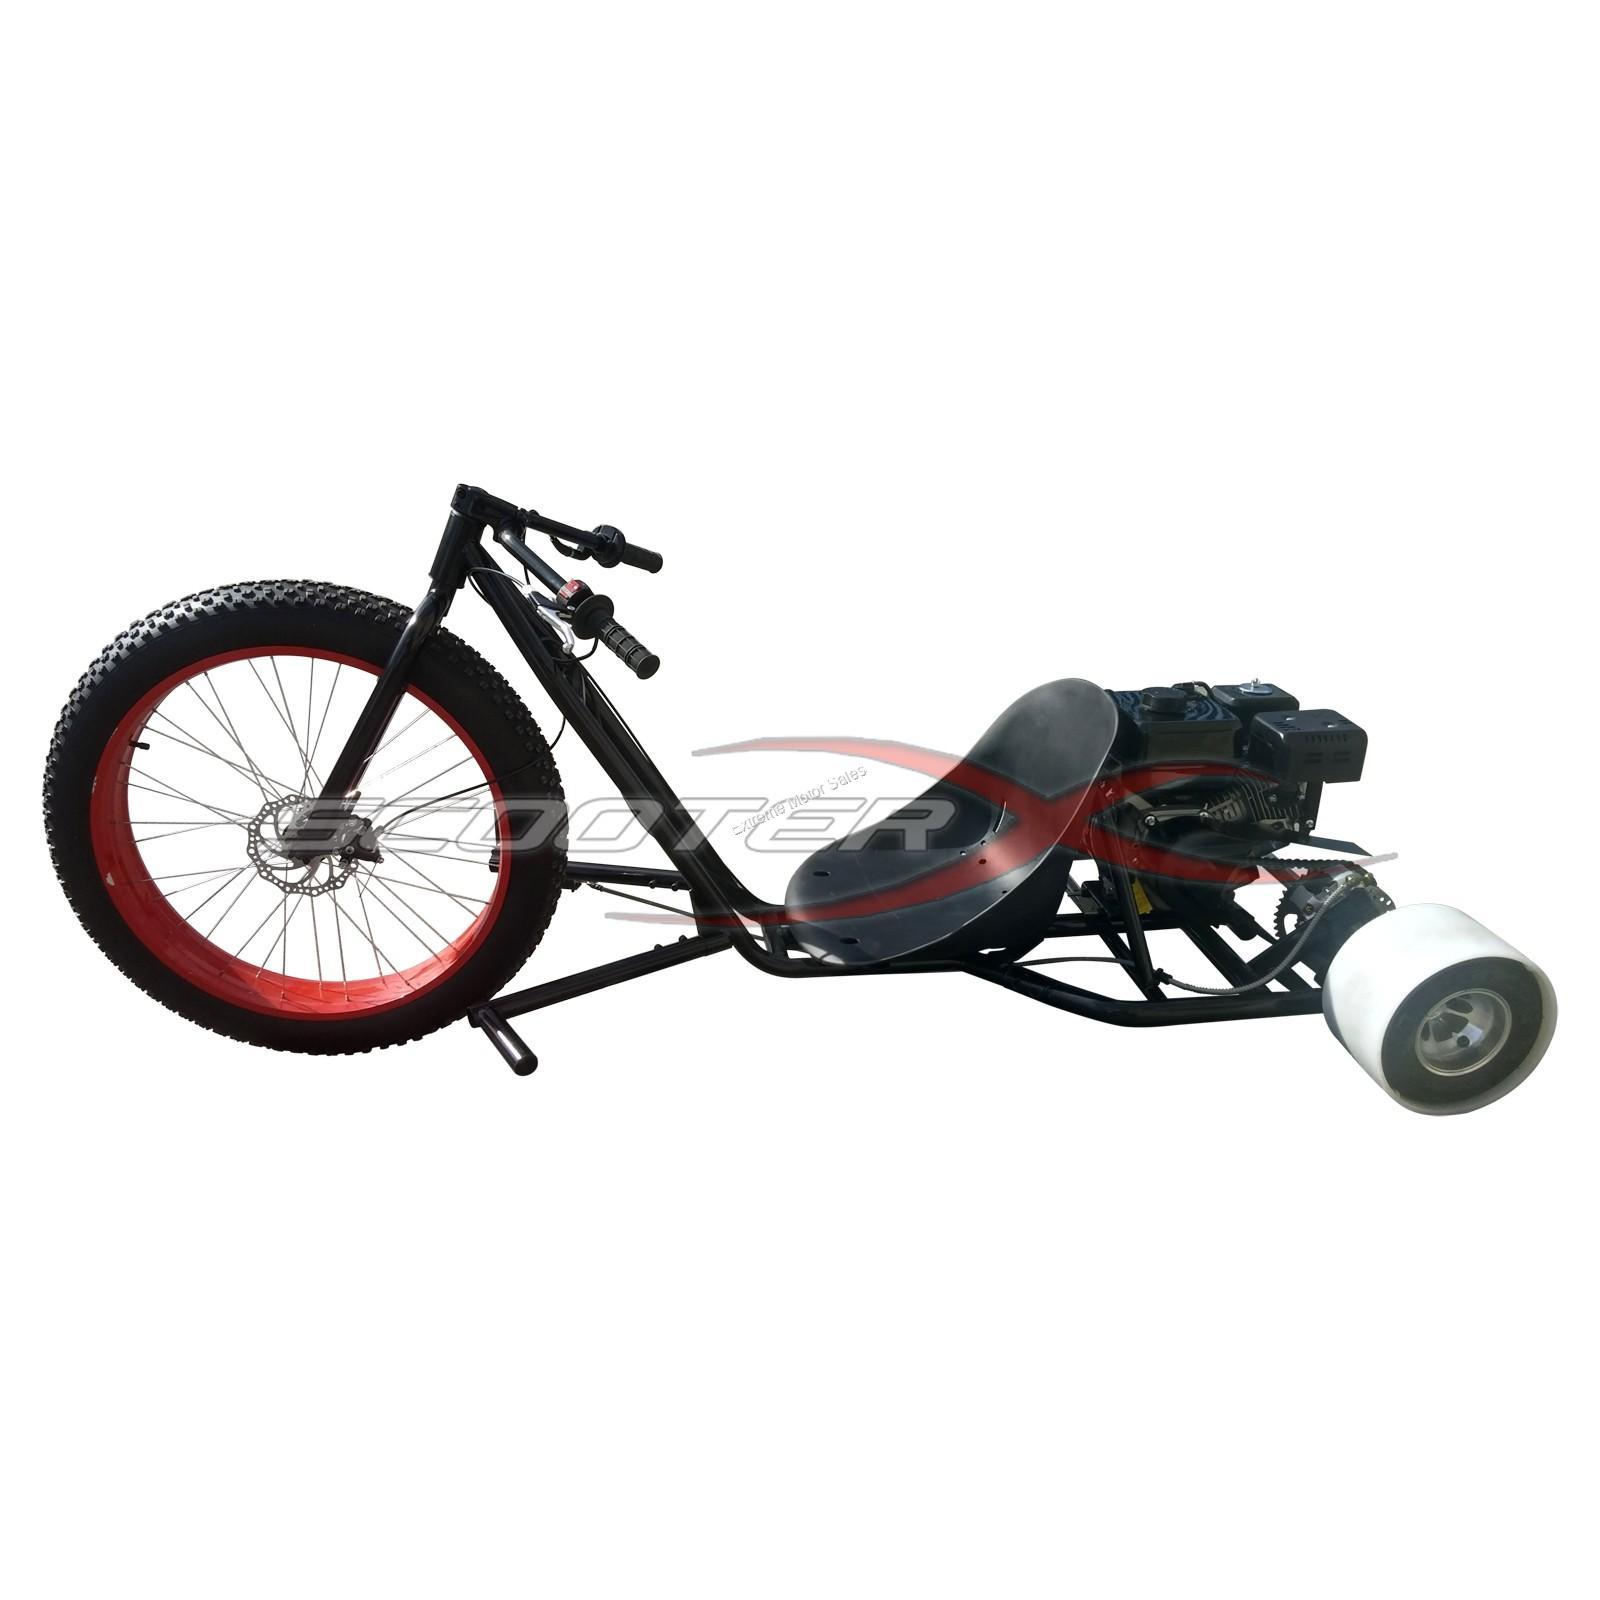 Extreme Motor Sales Inc Drift Trike Extreme 6 5 Hp Gas Drift Trike 3 Wheel Big Wheel Kart